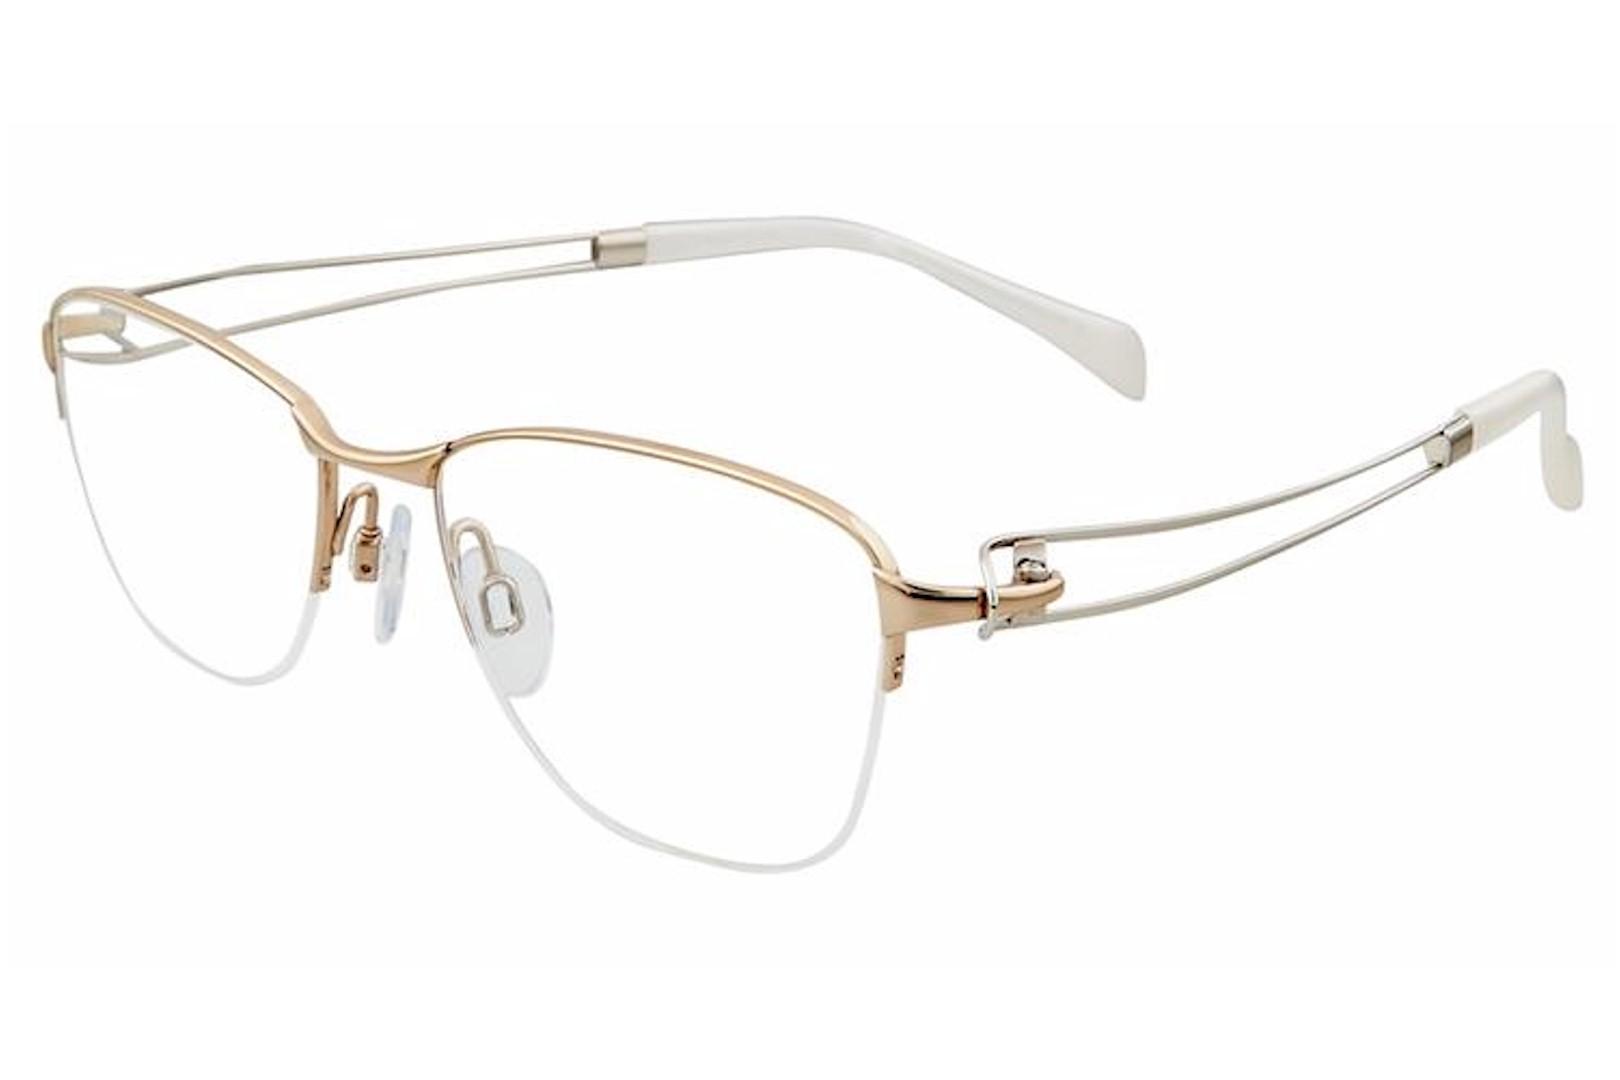 Line Art Xl 2051 : Charmant line art women s eyeglasses xl half